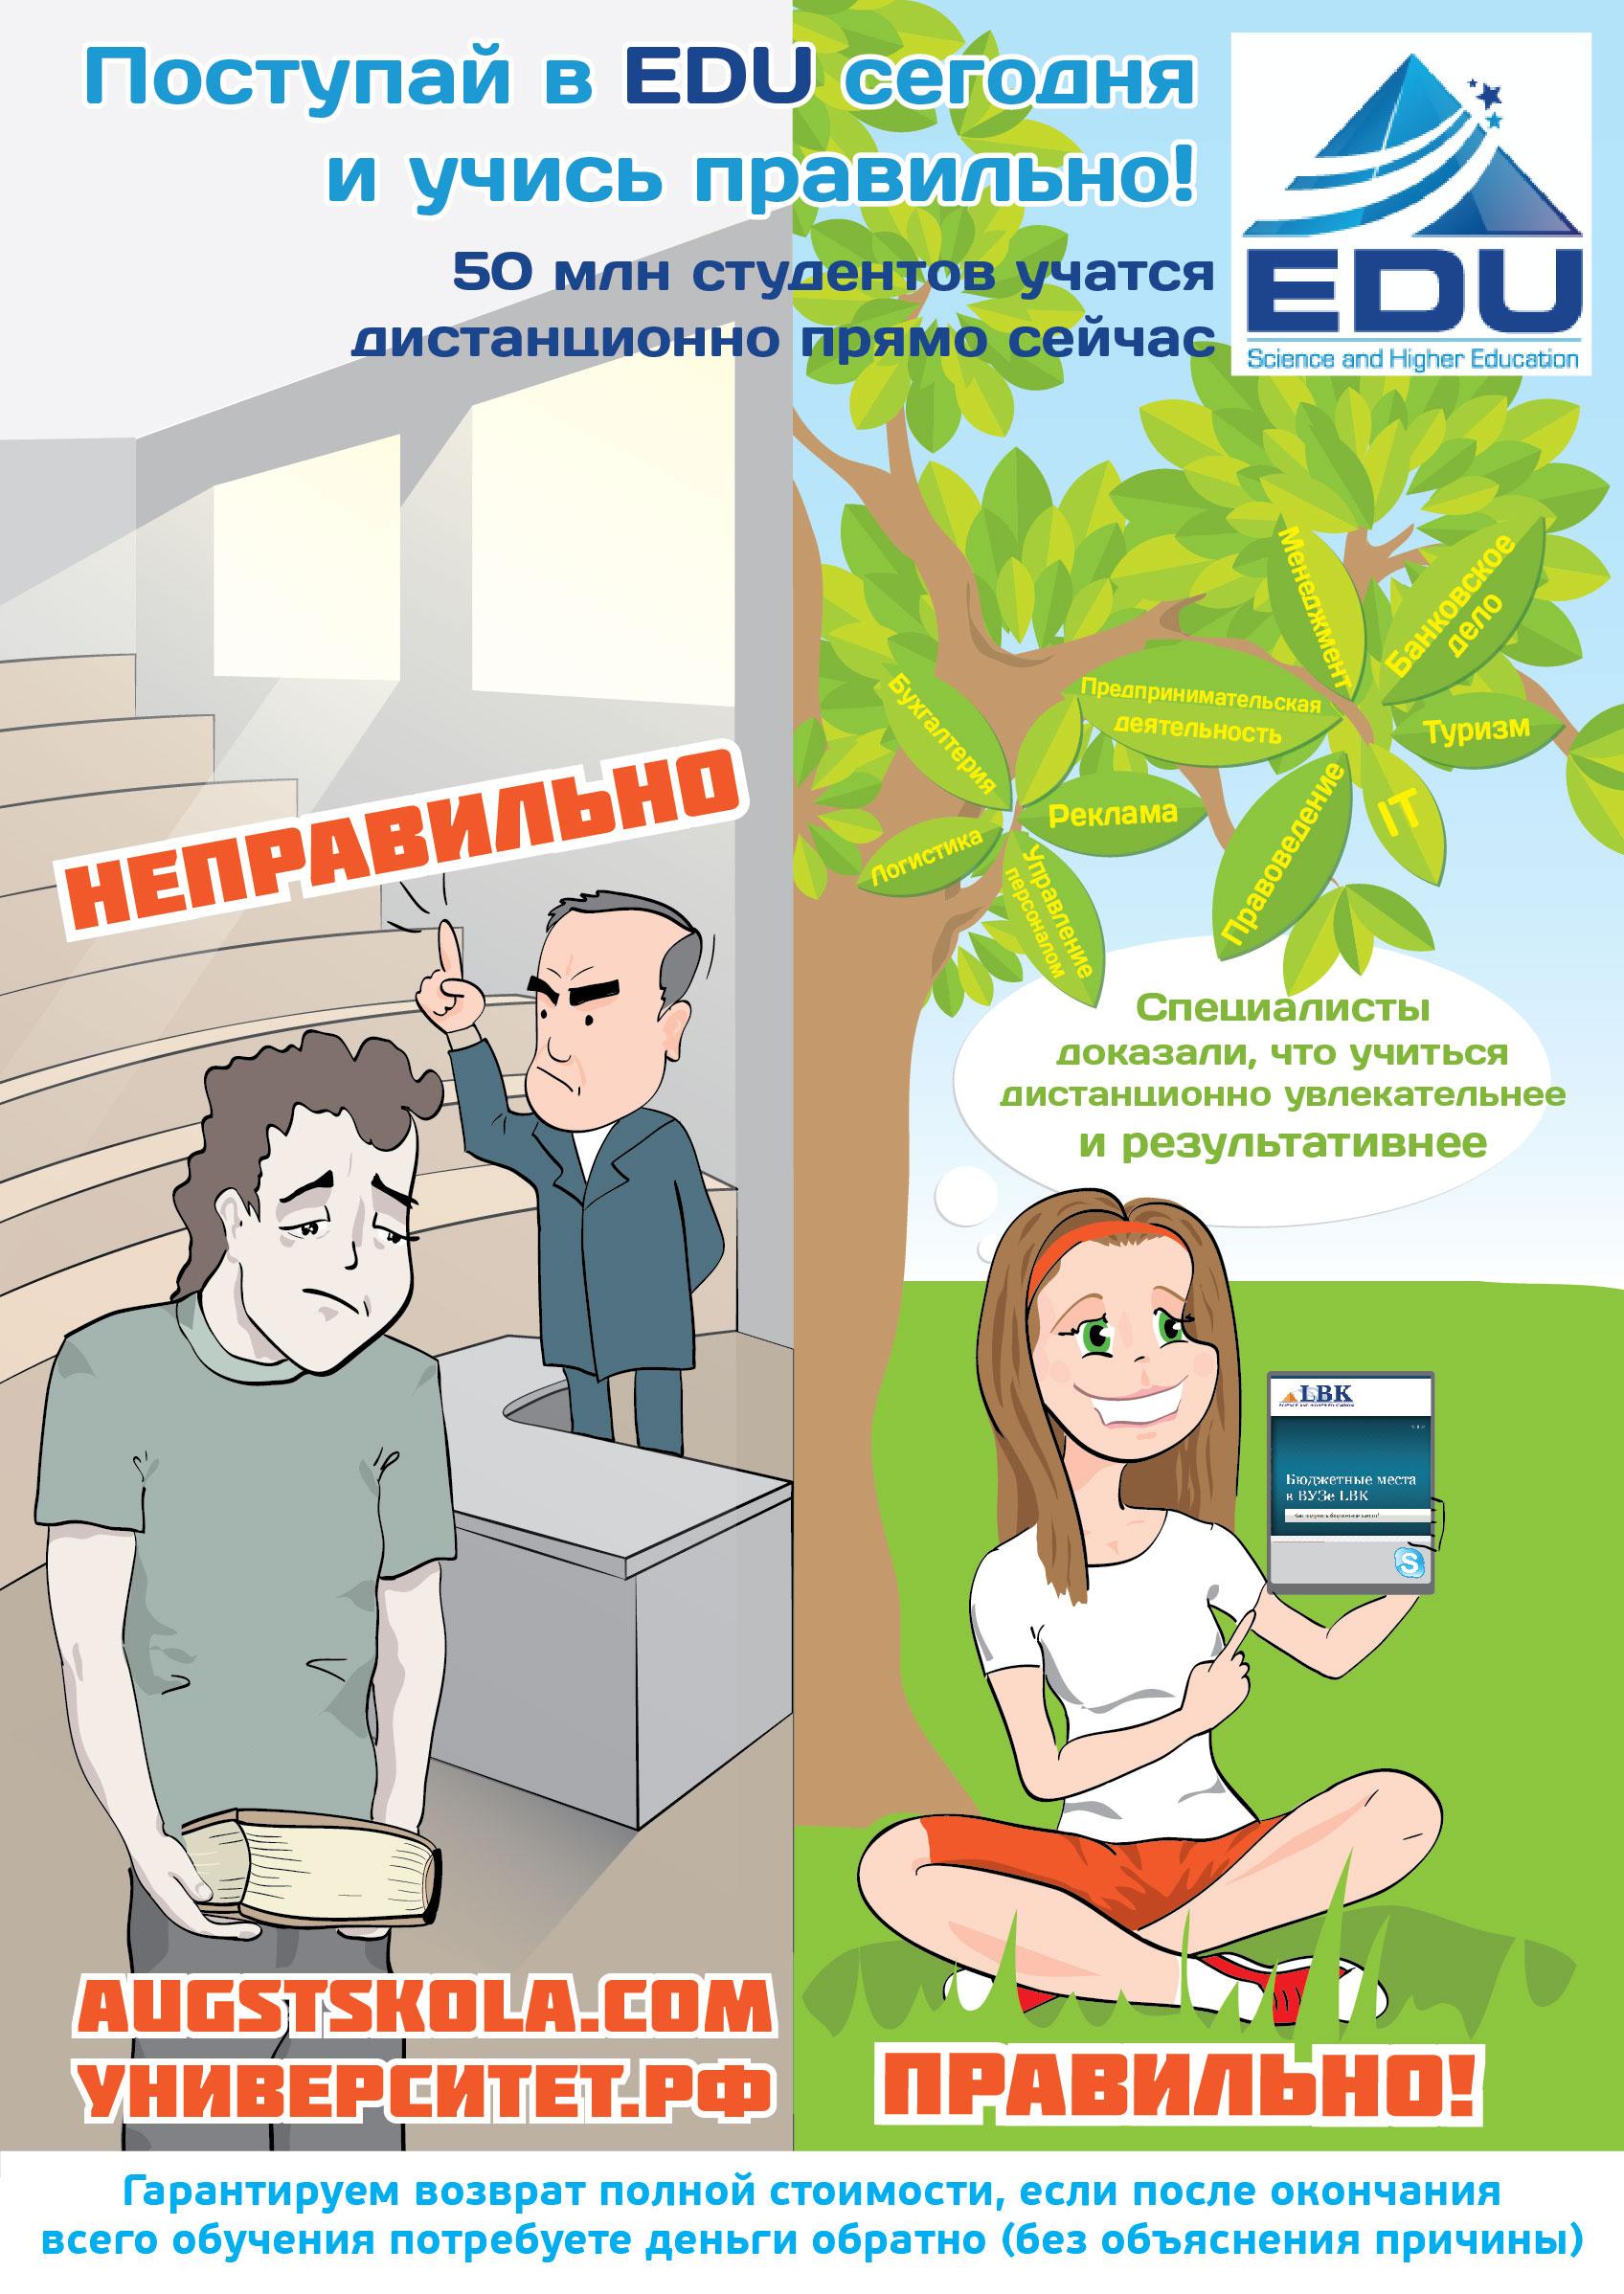 Университету требуется креативный плакат! фото f_89752f79564e5403.jpg